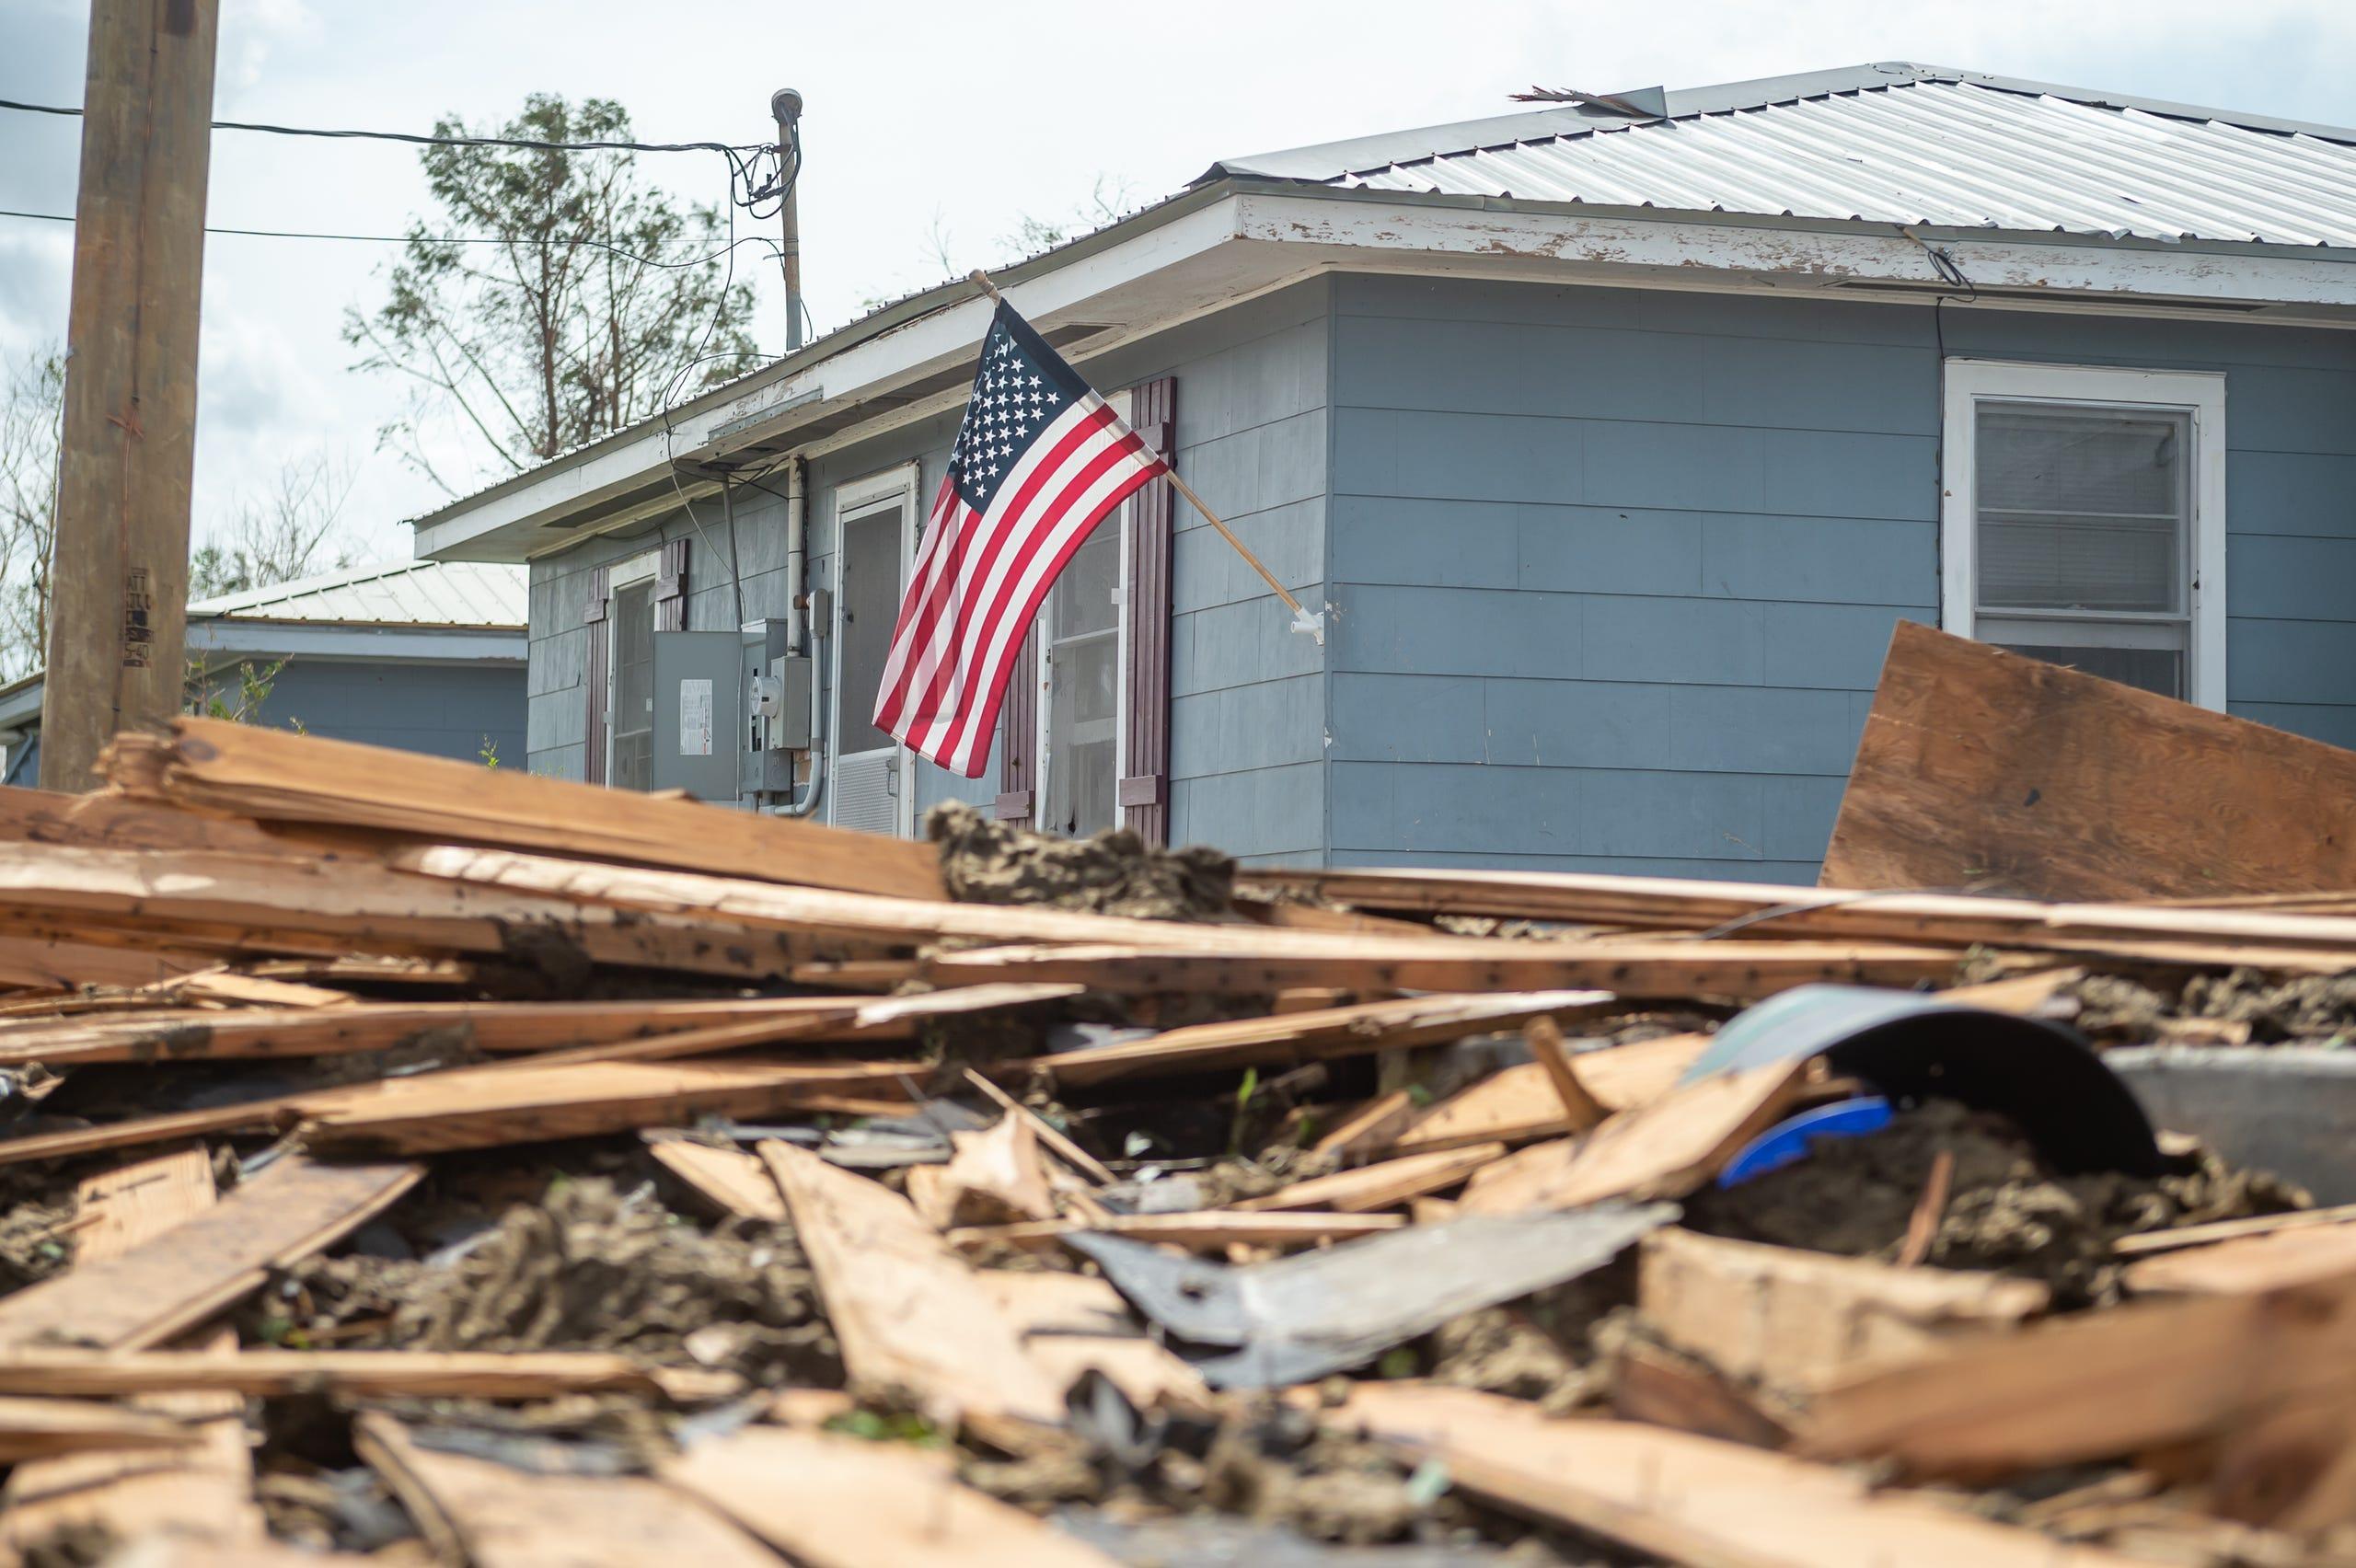 Damage caused by Hurricane Ida in Houma, LA. Monday, Aug. 30, 2021.